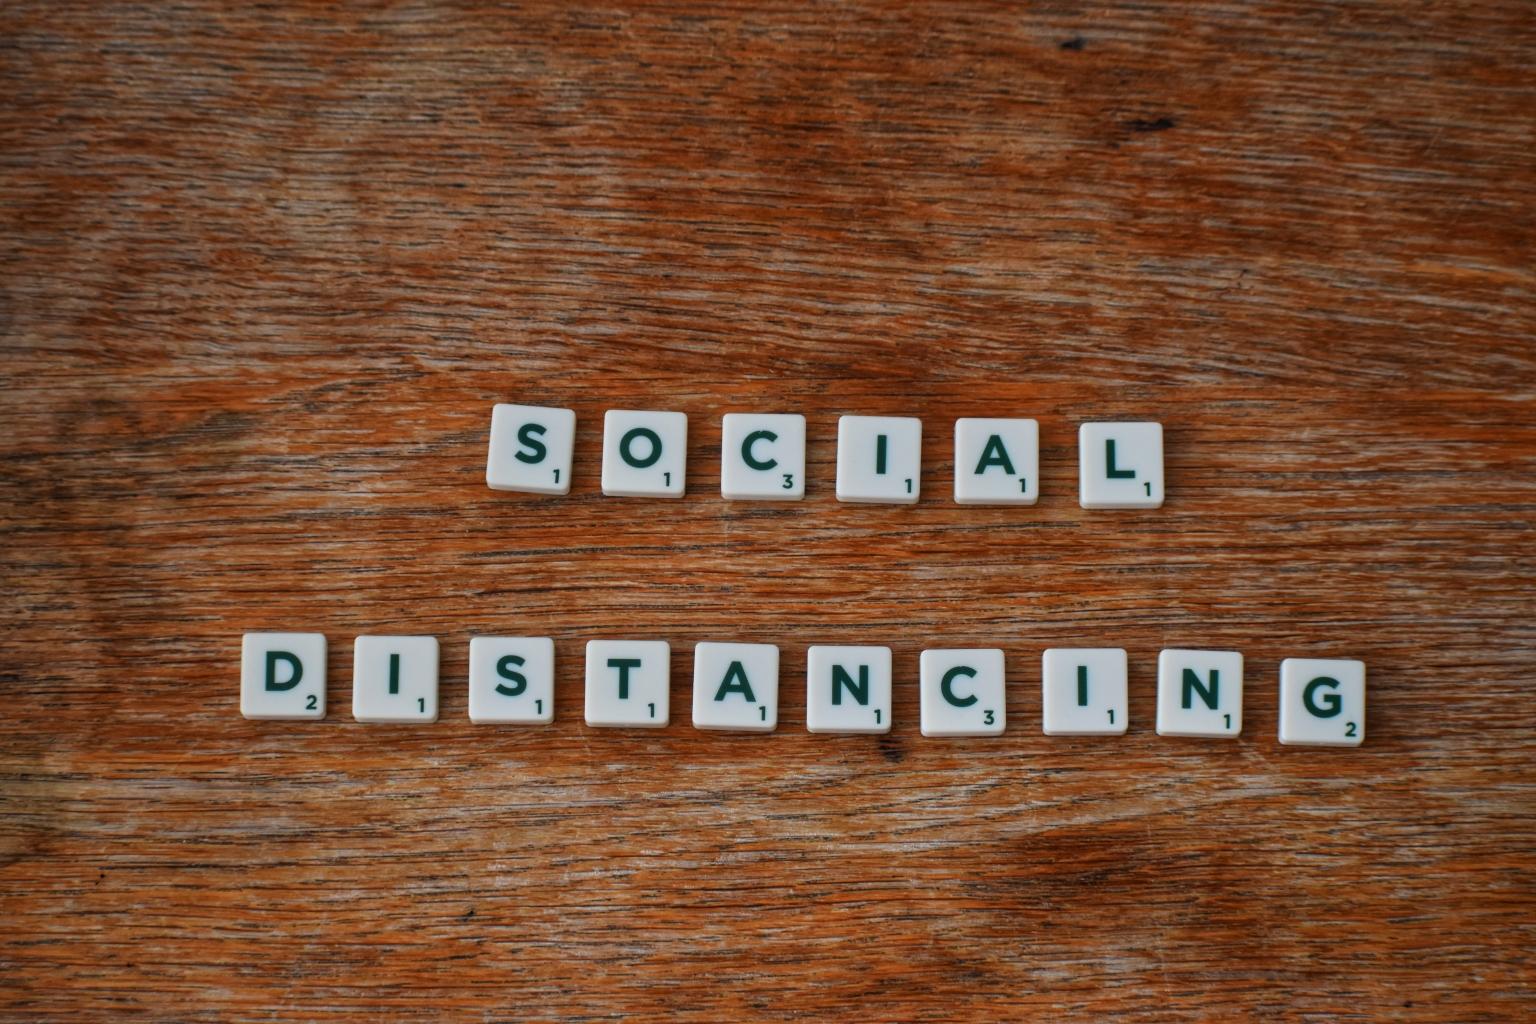 Be a Pro at Social Distancing